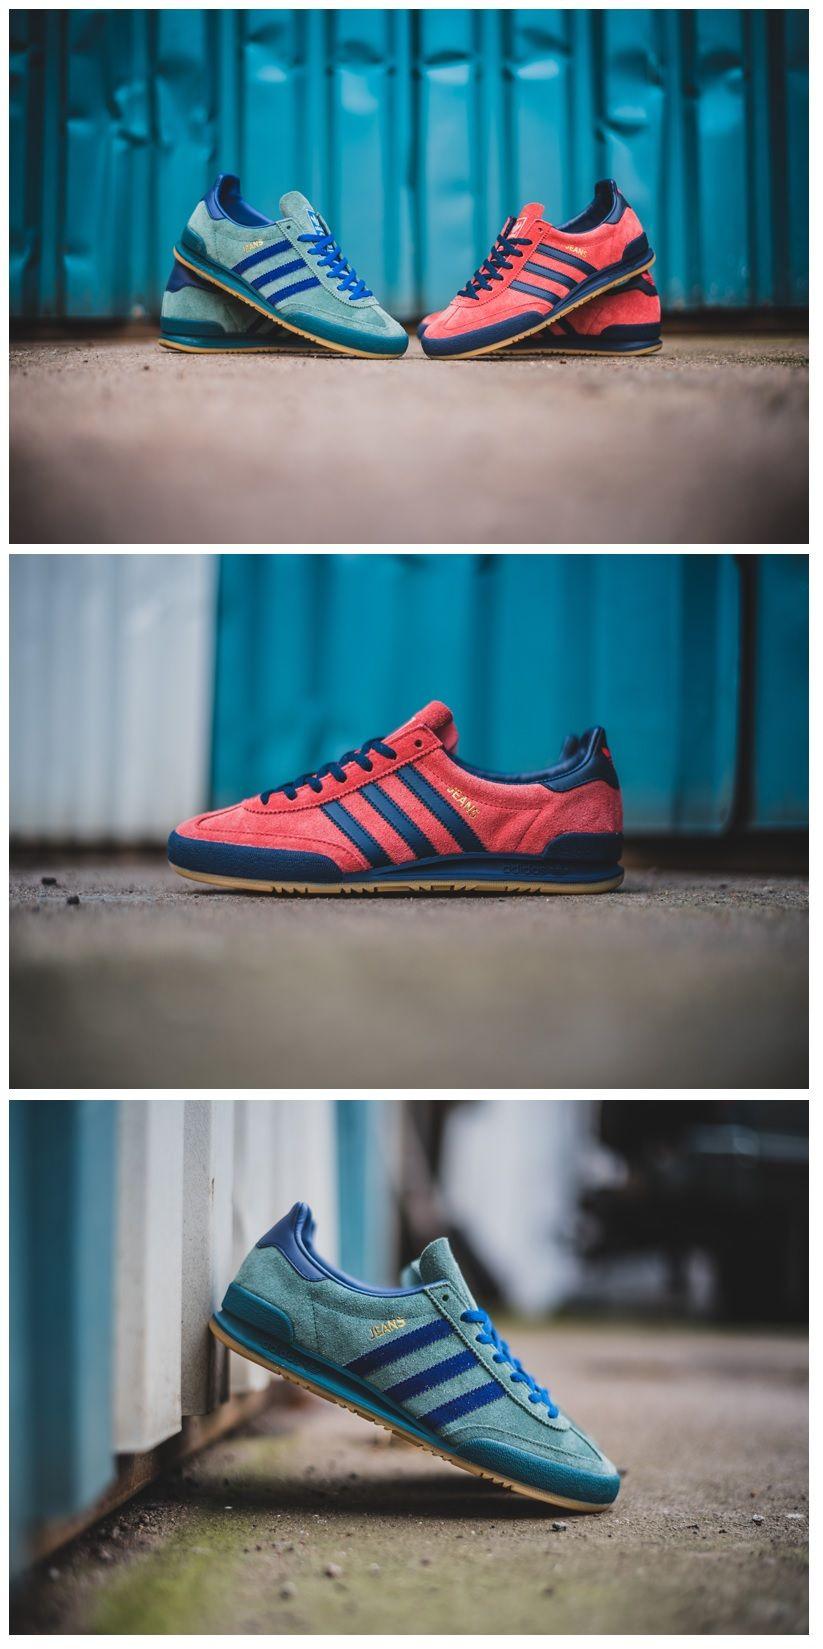 Adidas Jeans | Adidas originals jeans